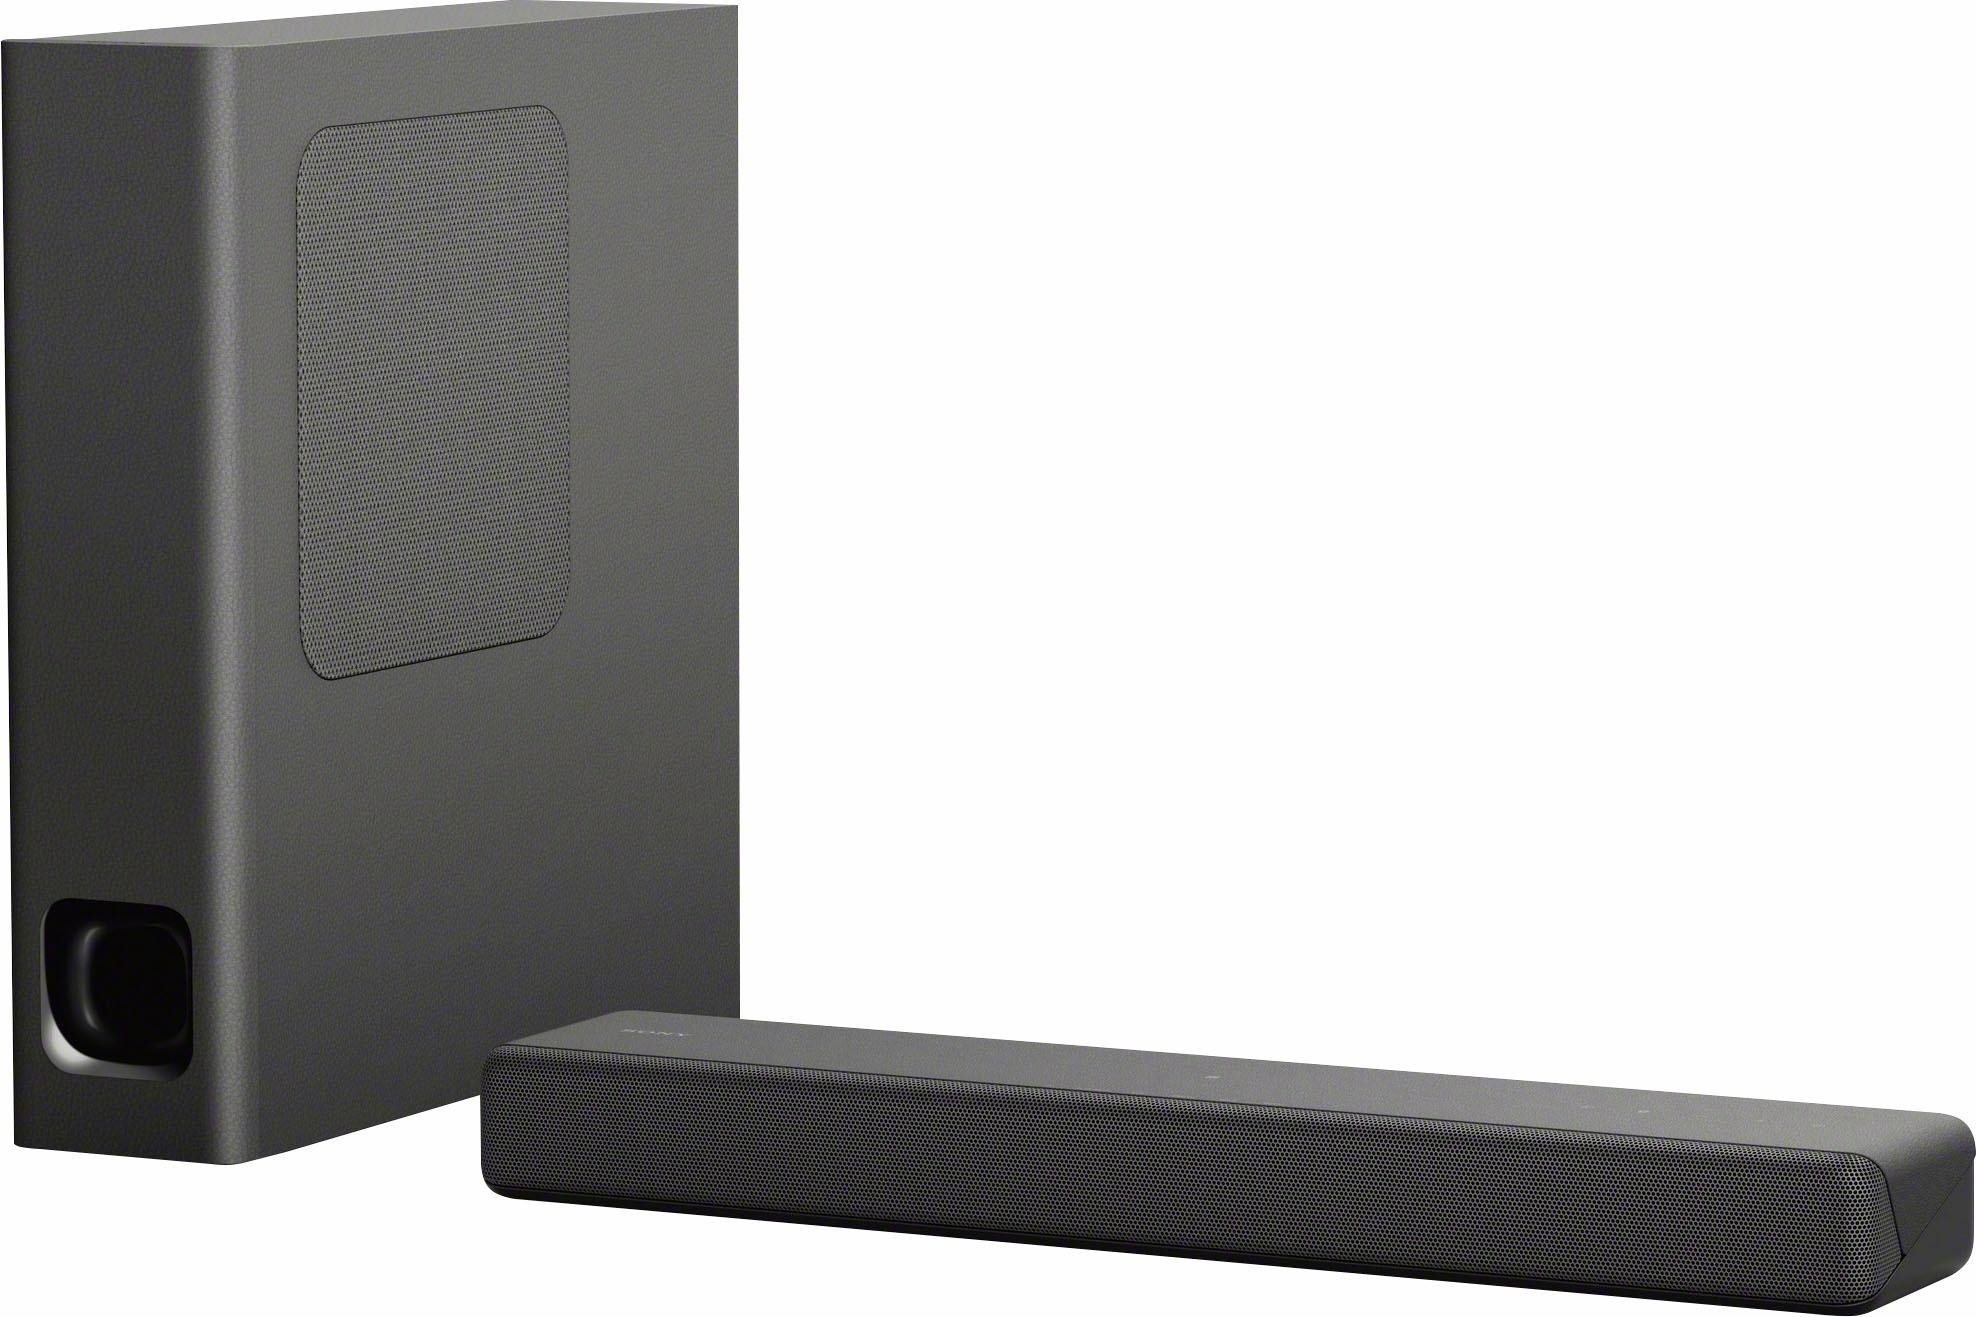 SONY soundbar HT-MT 300/HT-MT 301 compacte soundbar (draadloze subwoofer, Bluetooth, NFC, USB) nu online kopen bij OTTO